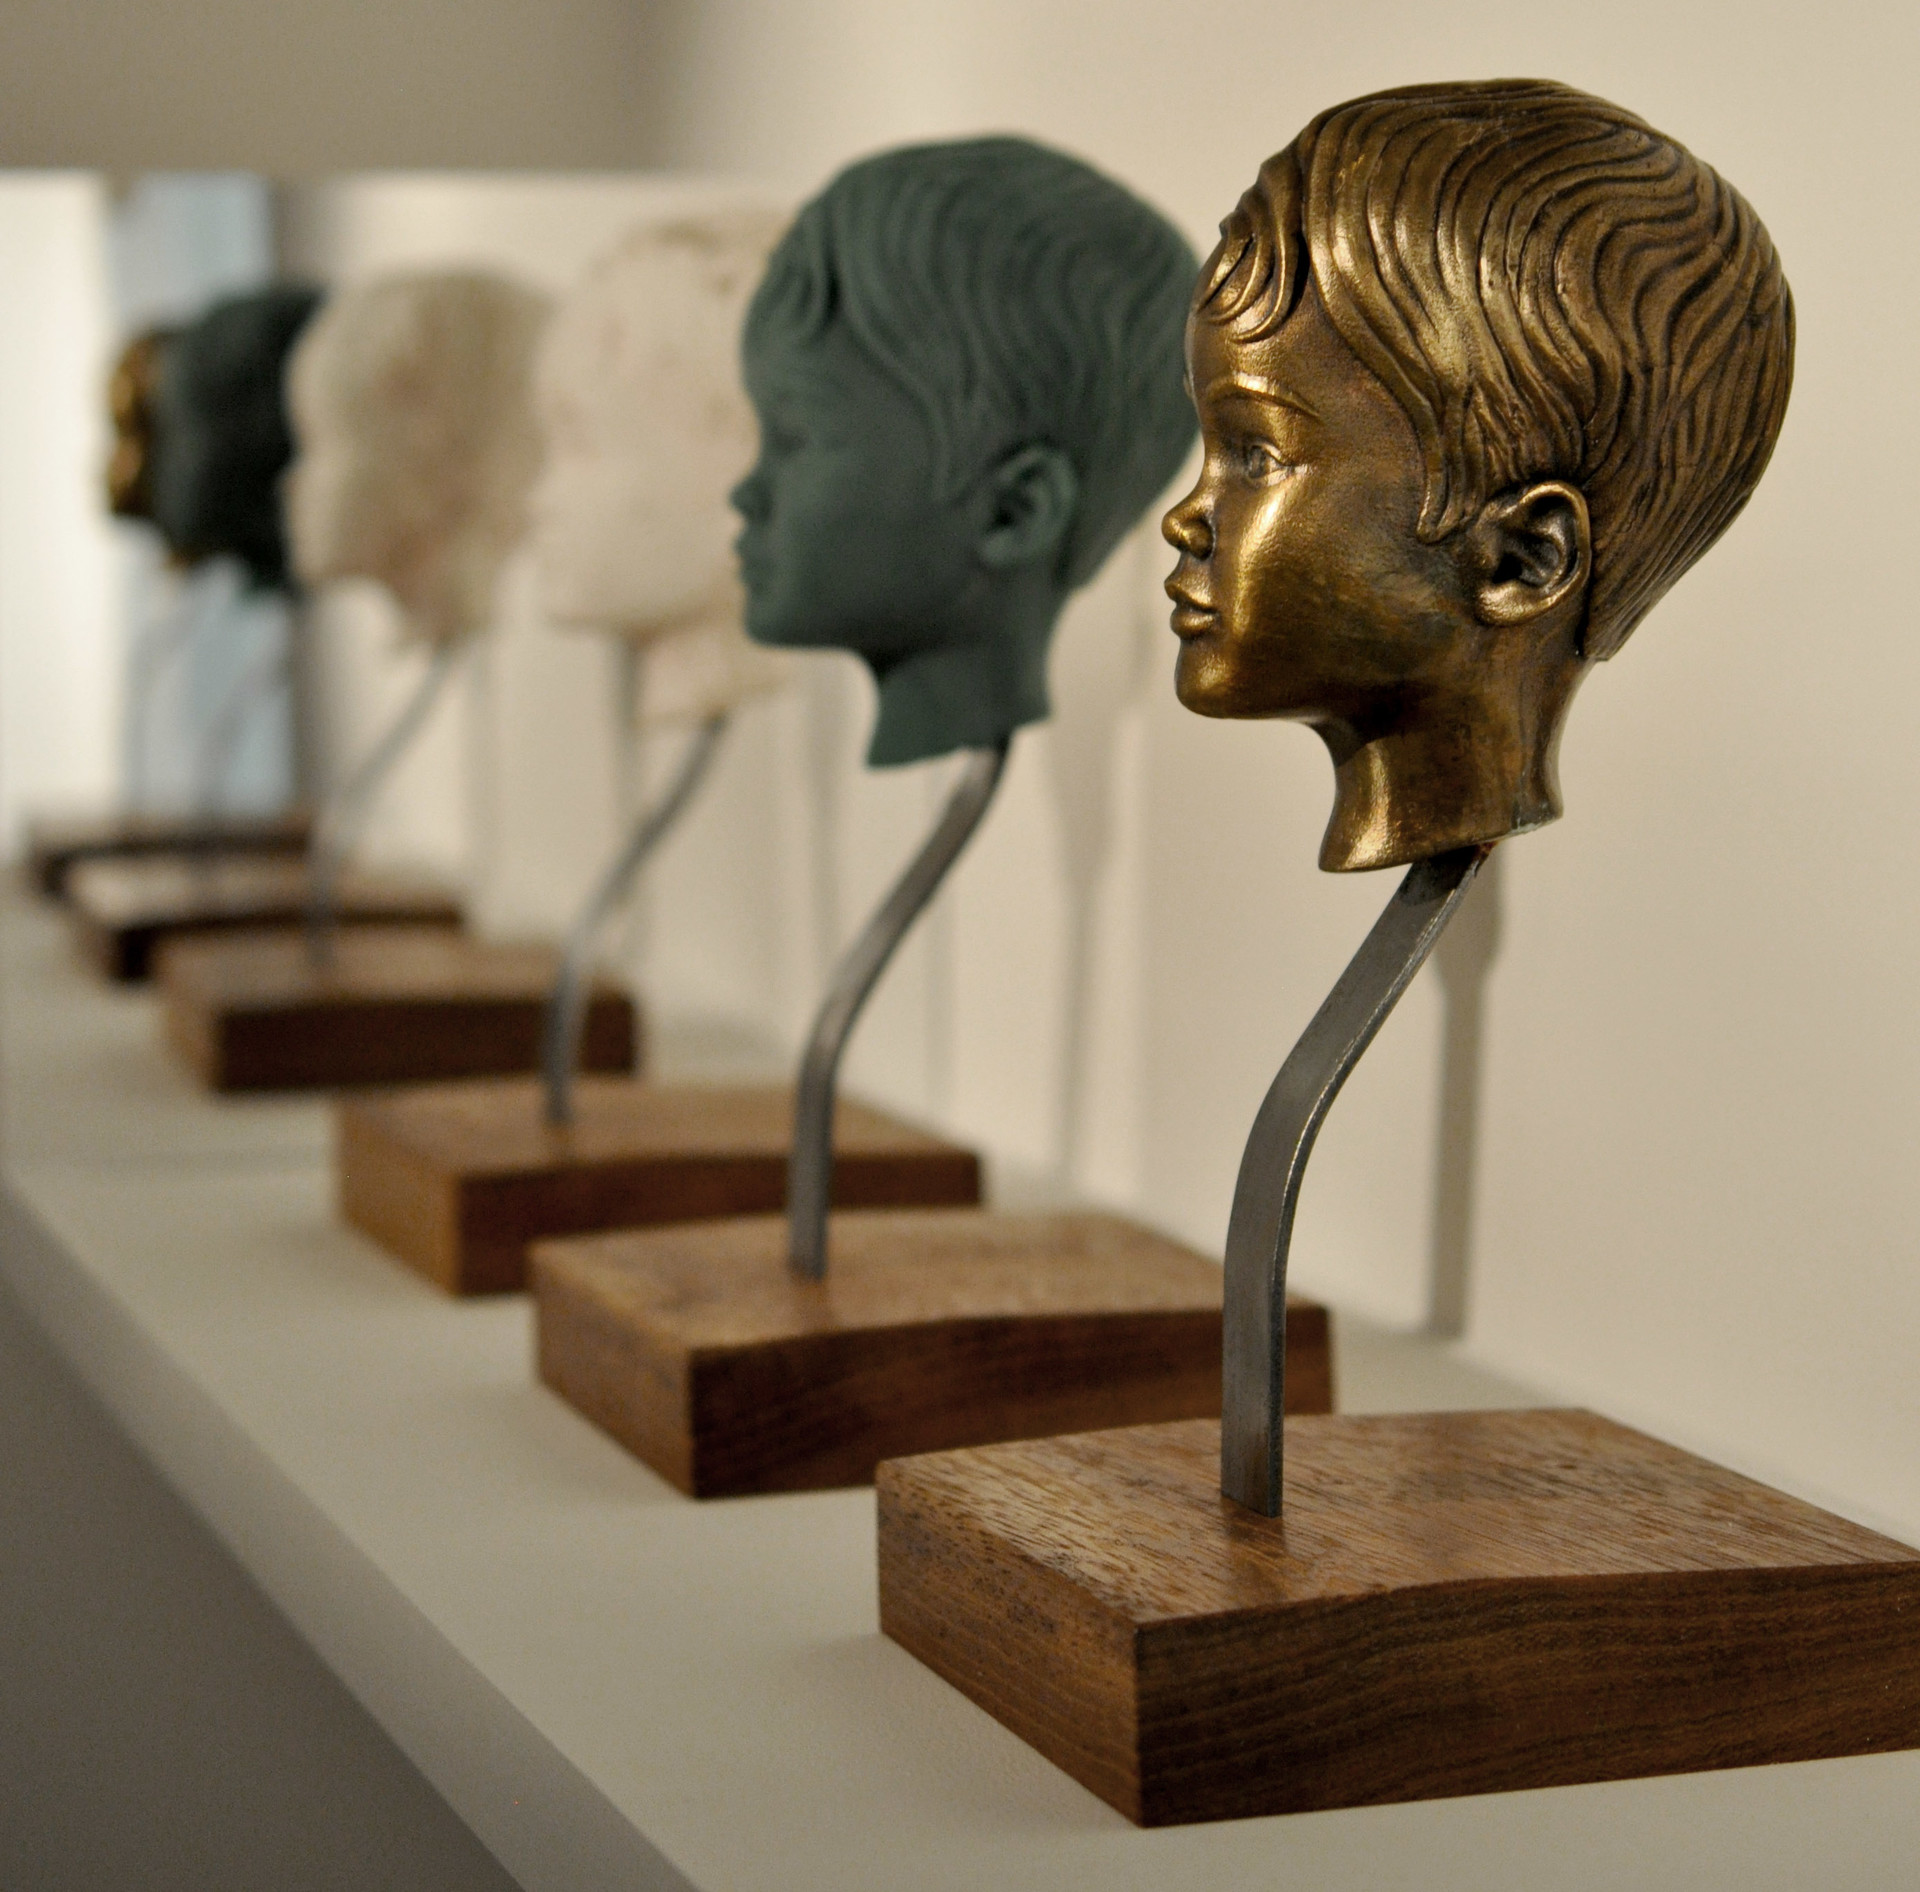 Achie_Z Brush Study & Bronzed 3D Print